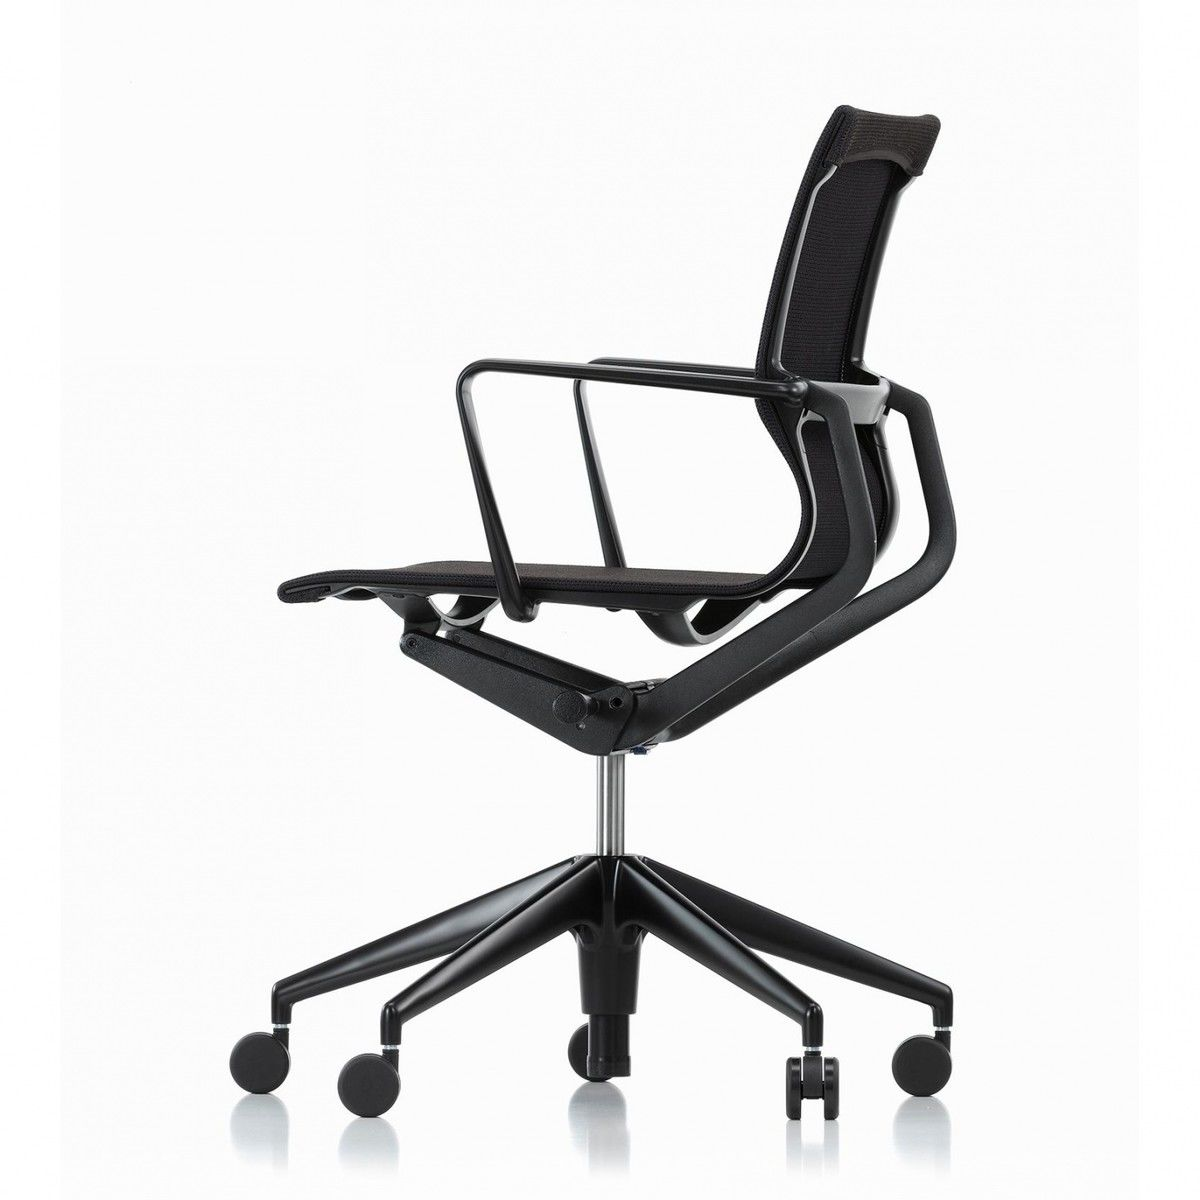 Vitra physix meda chaise de bureau vitra for Chaise de bureau vitra prix